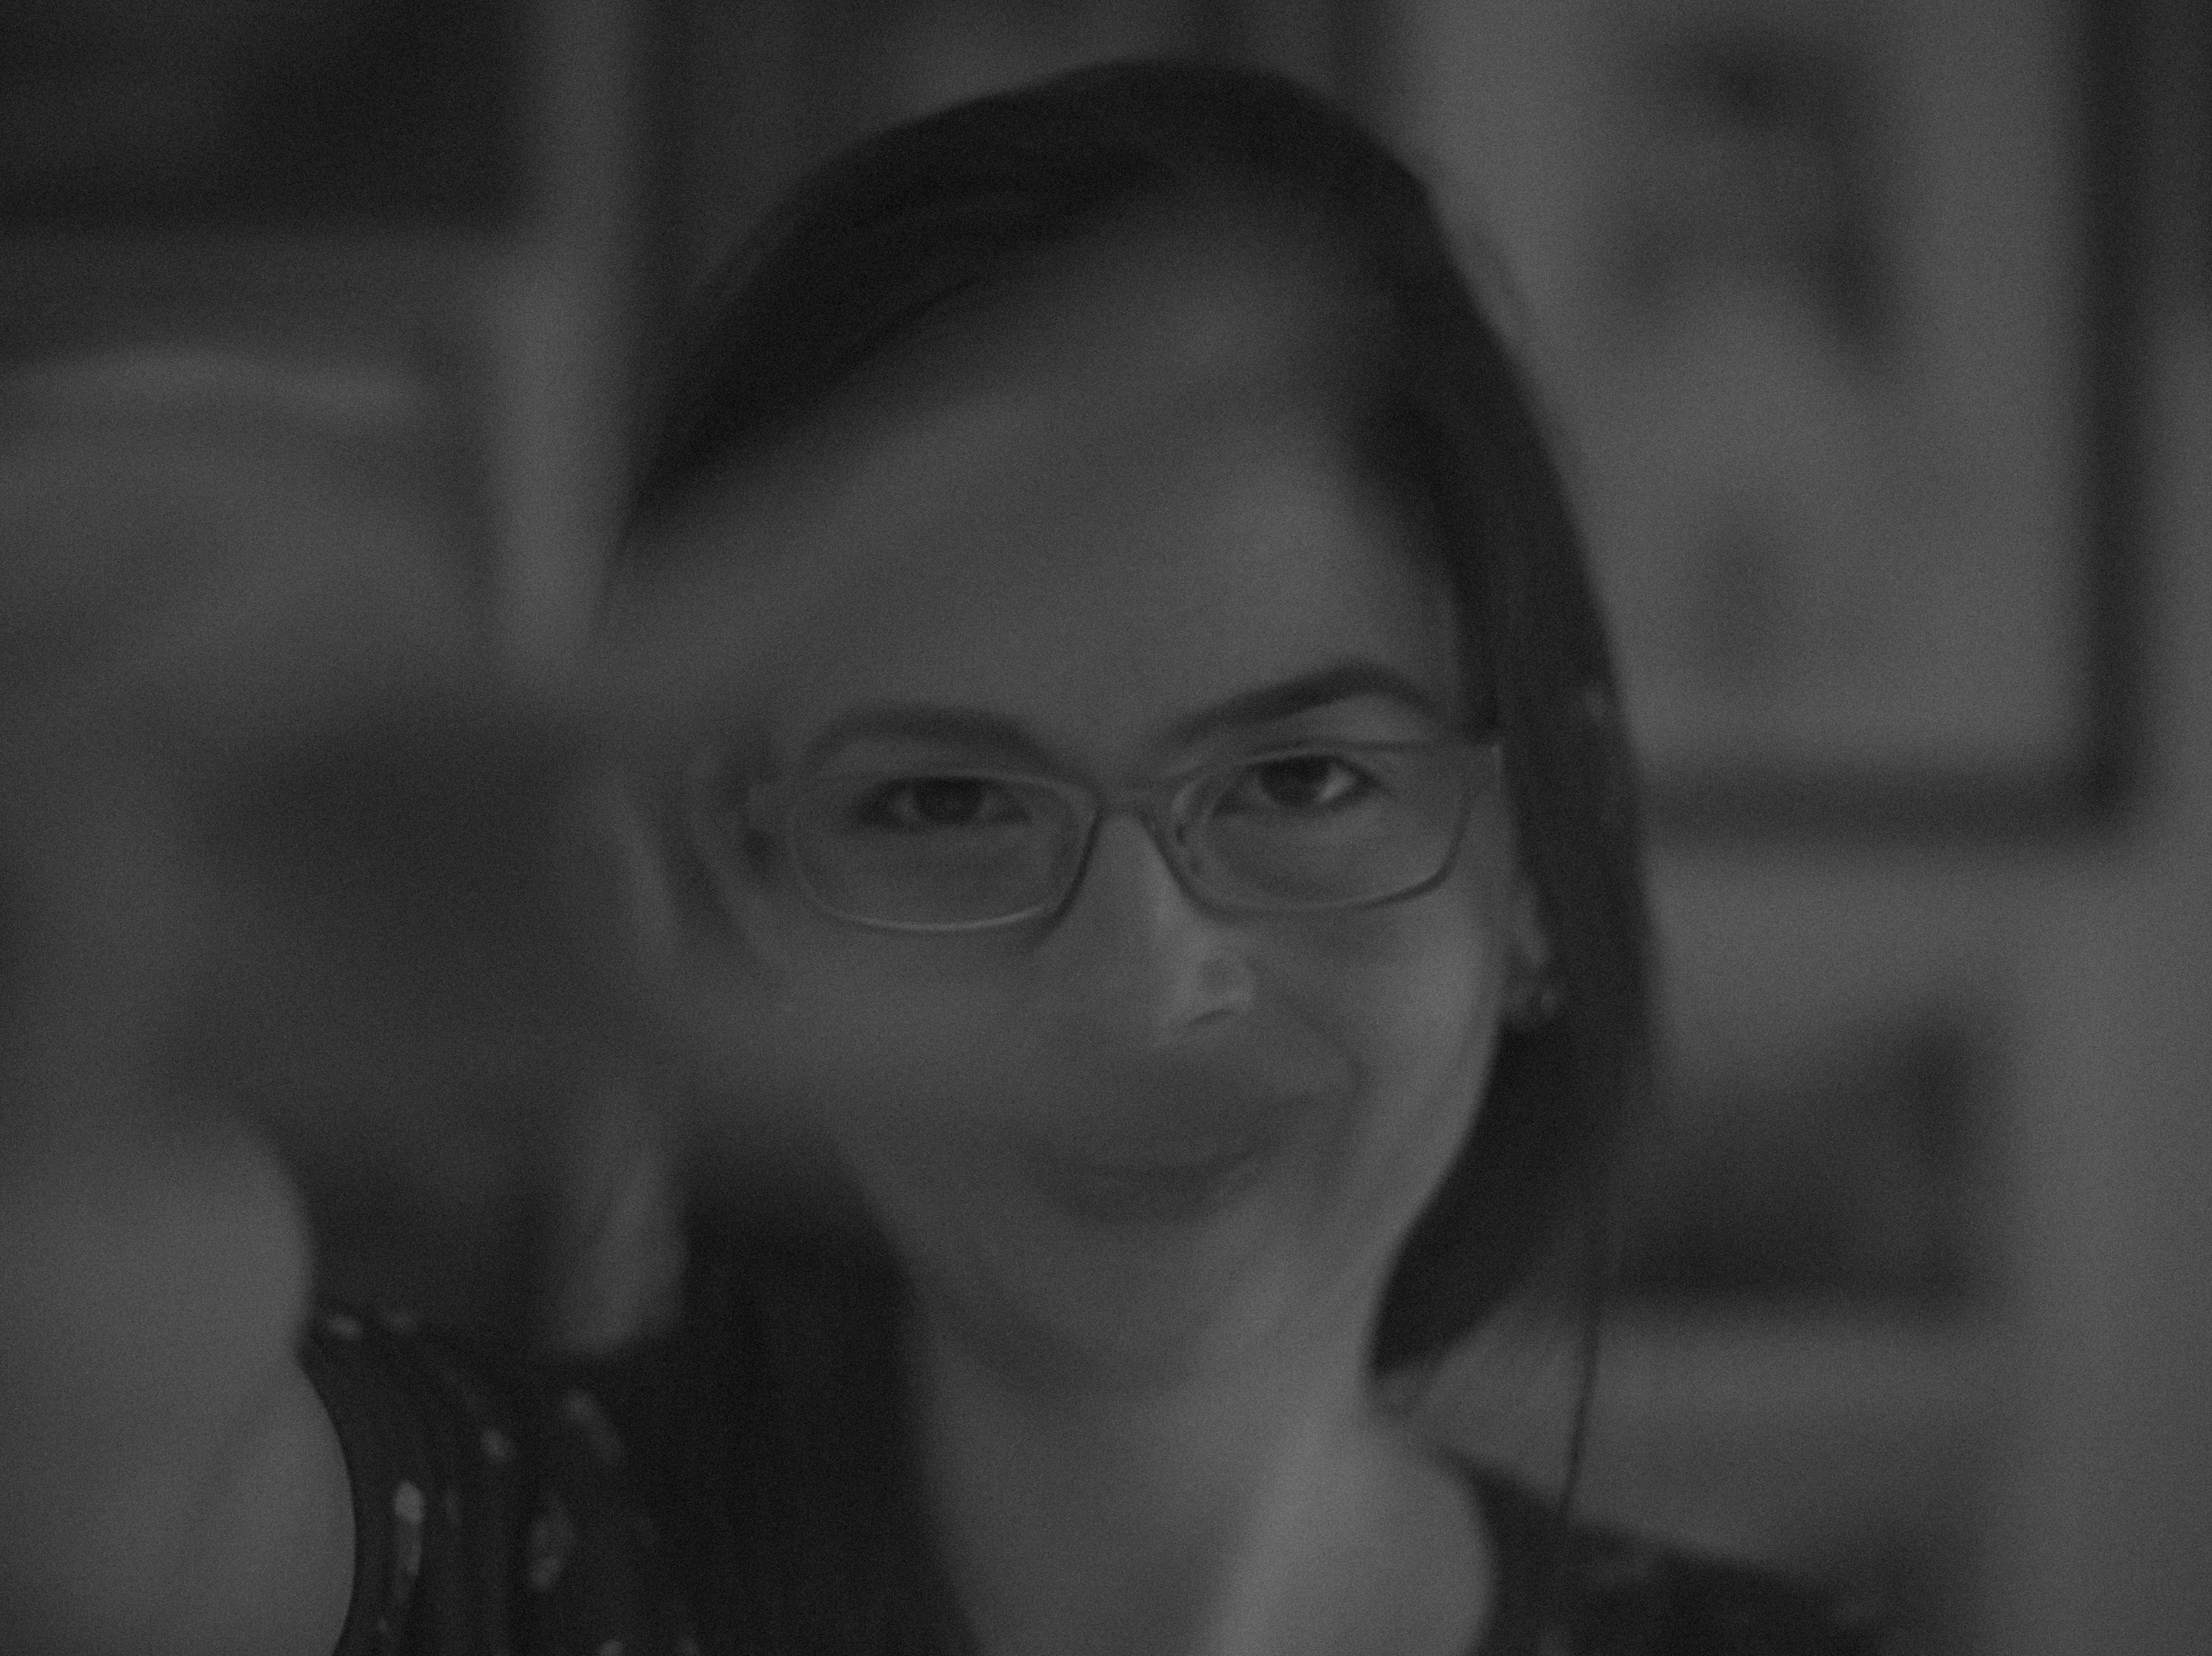 Free stock photo of dame, eye glasses, pb, smile